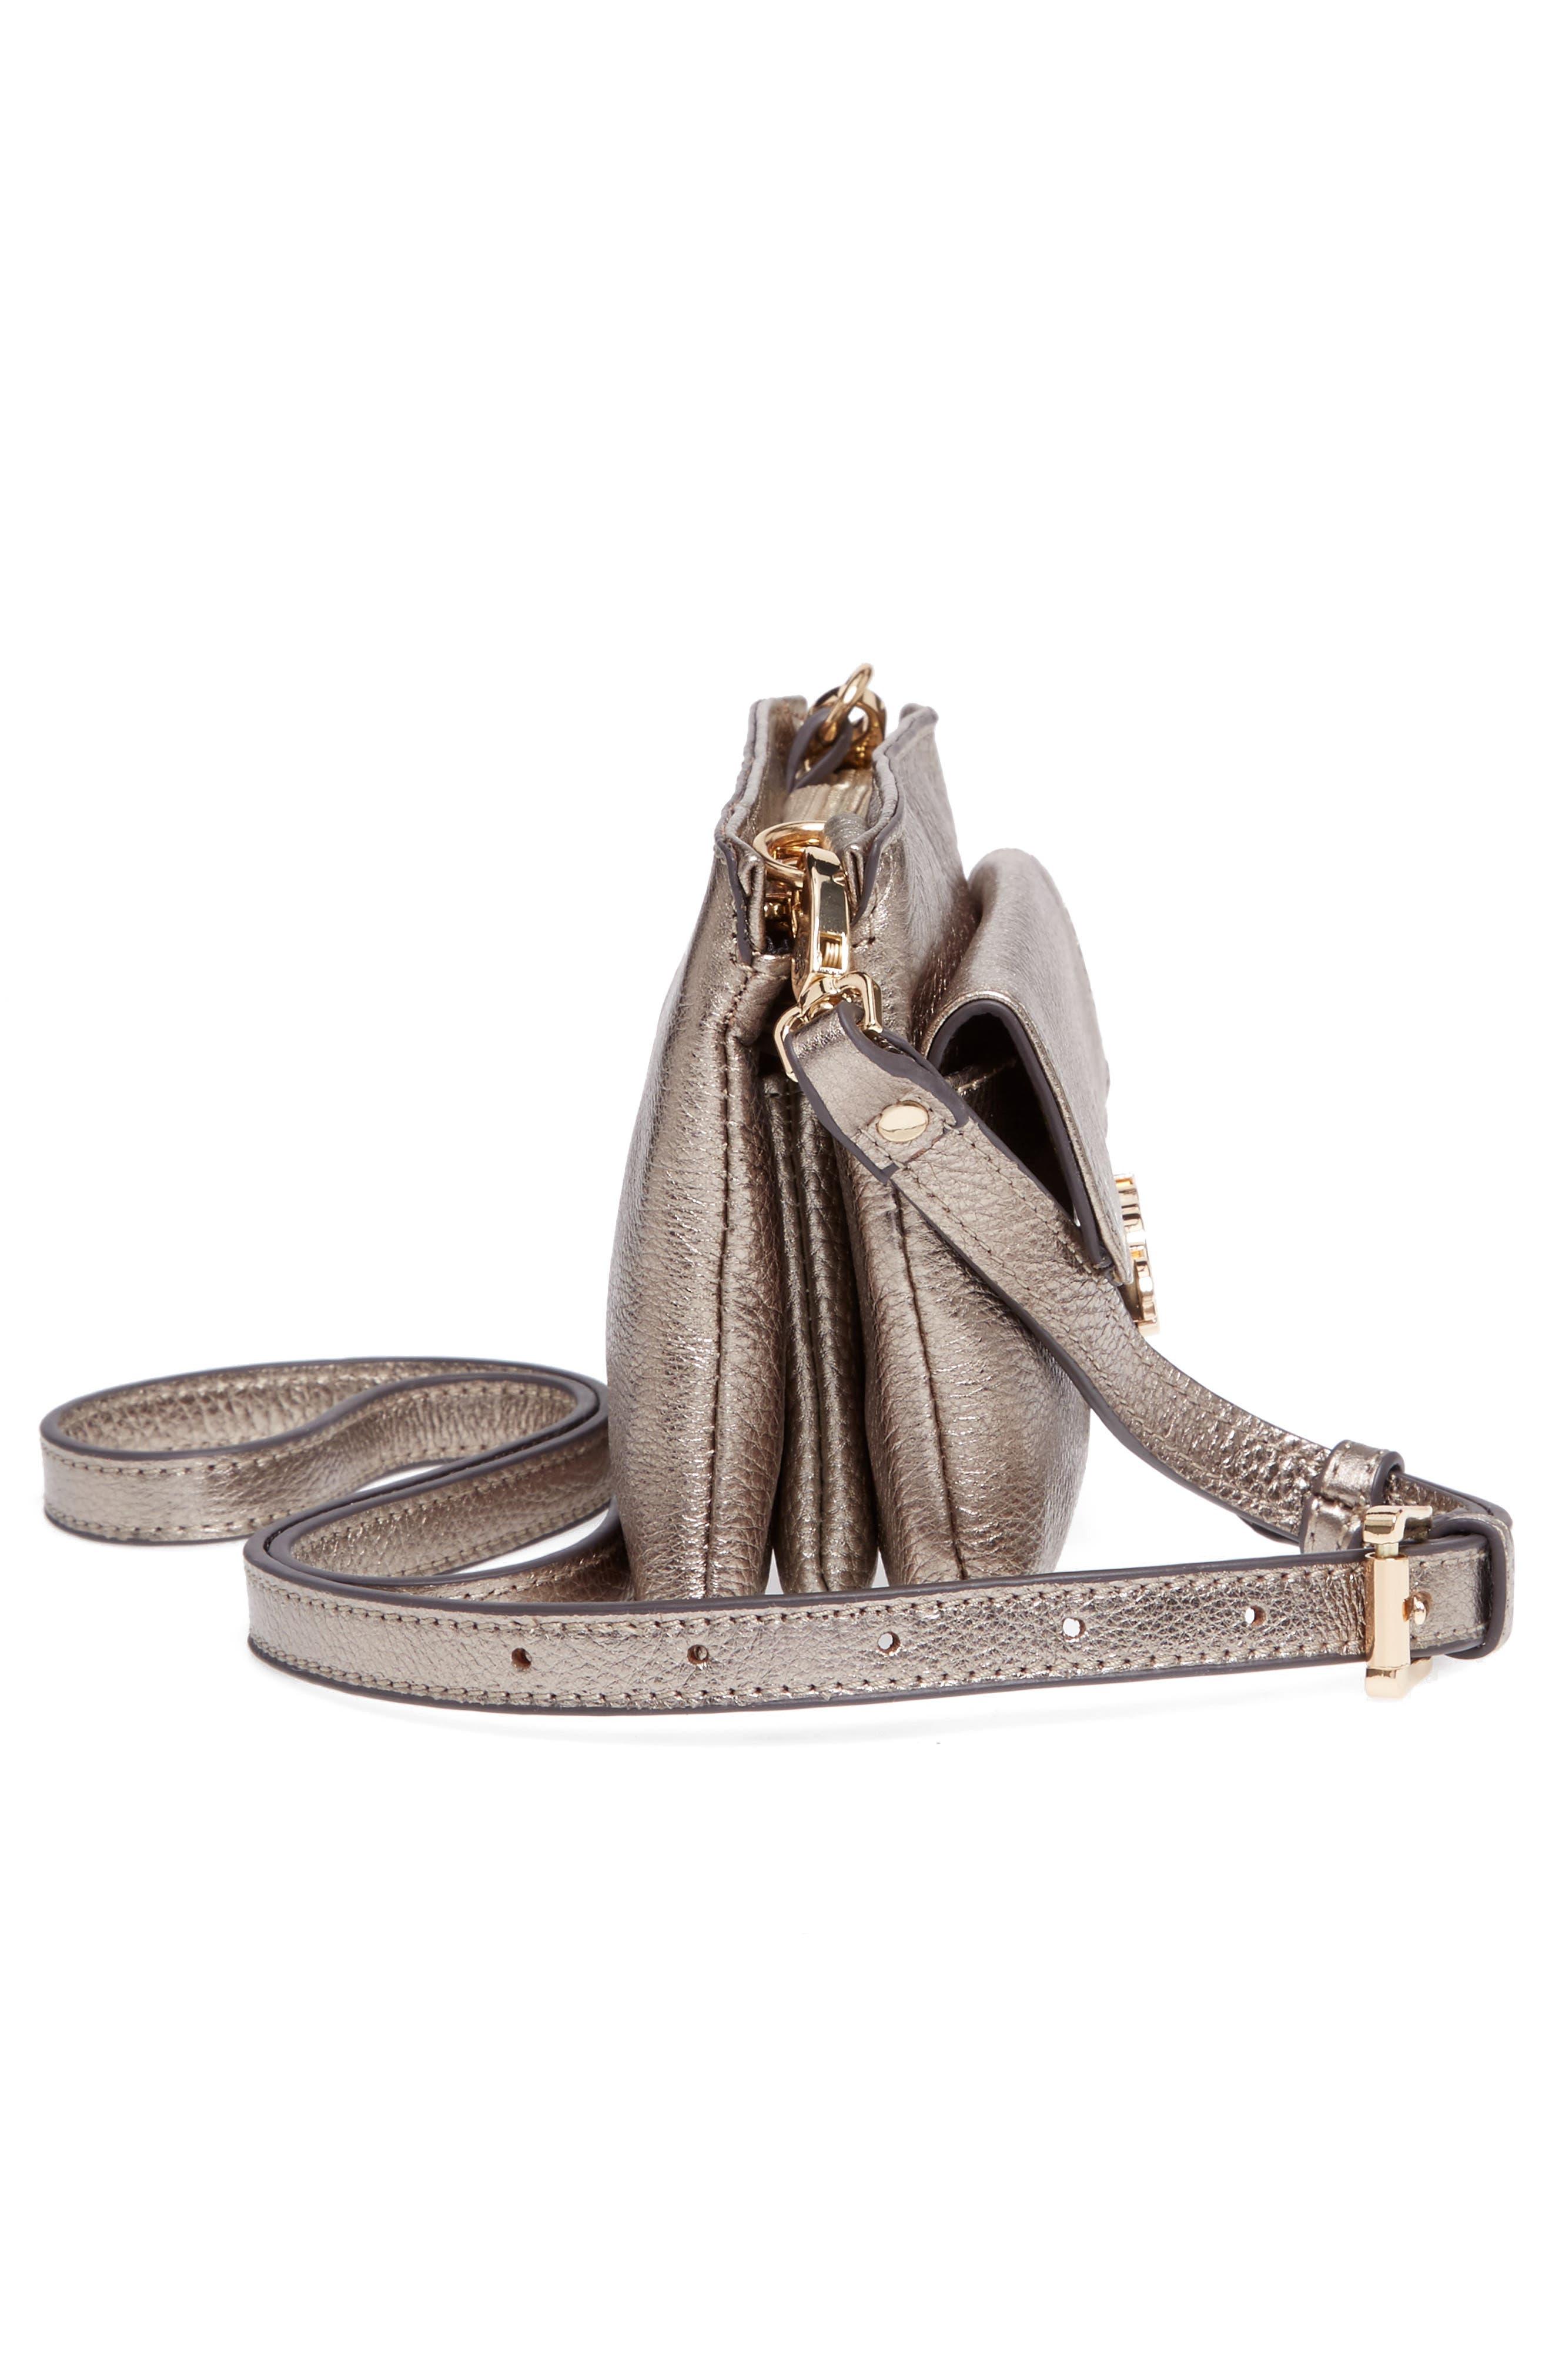 Katerini Leather Crossbody Wallet,                             Alternate thumbnail 29, color,